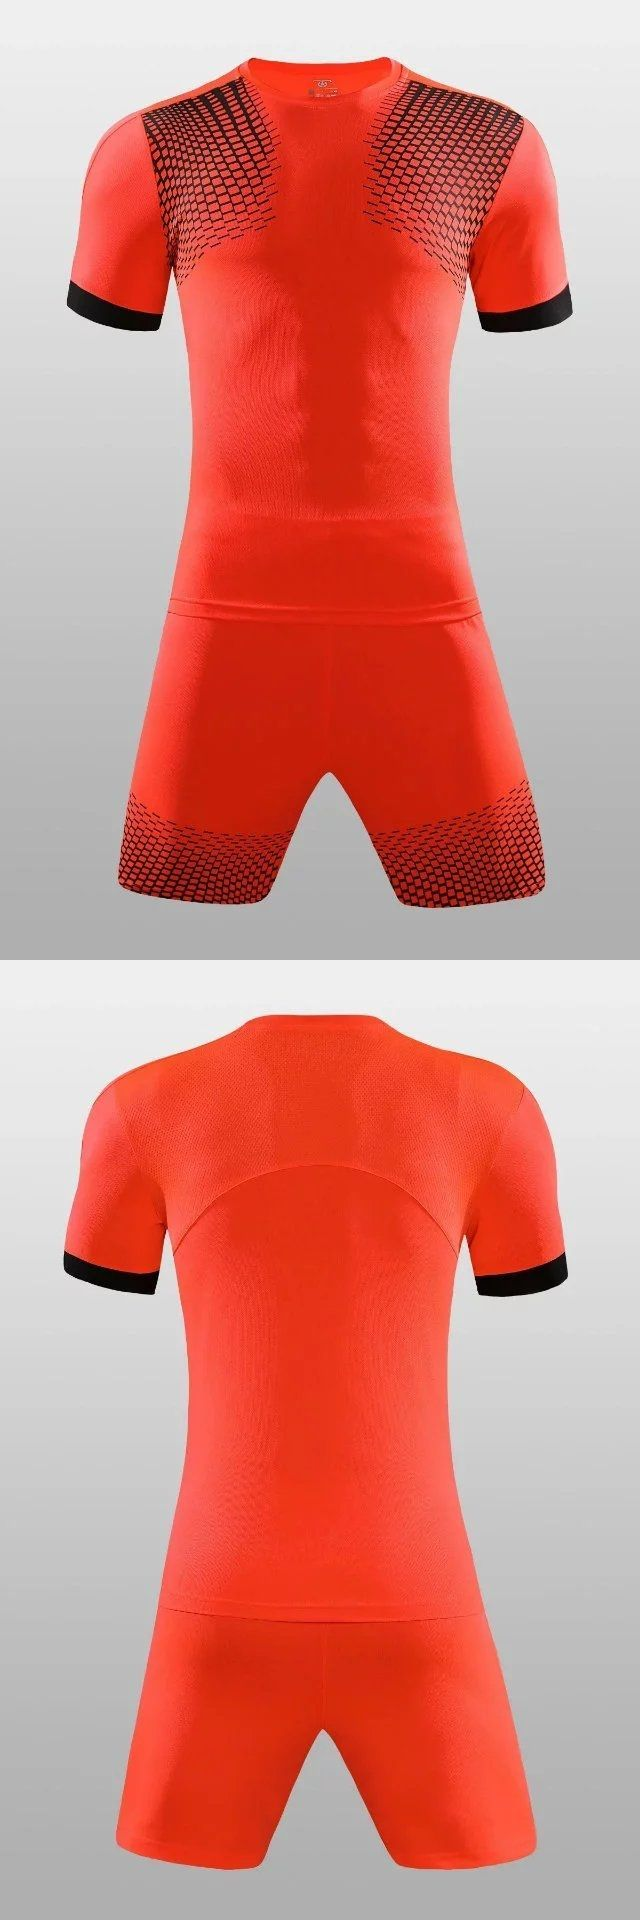 Football Jersey Men's #soccer kits print Long sleeve jersey football sets training Sports suit soccer jerseys orange 17/18